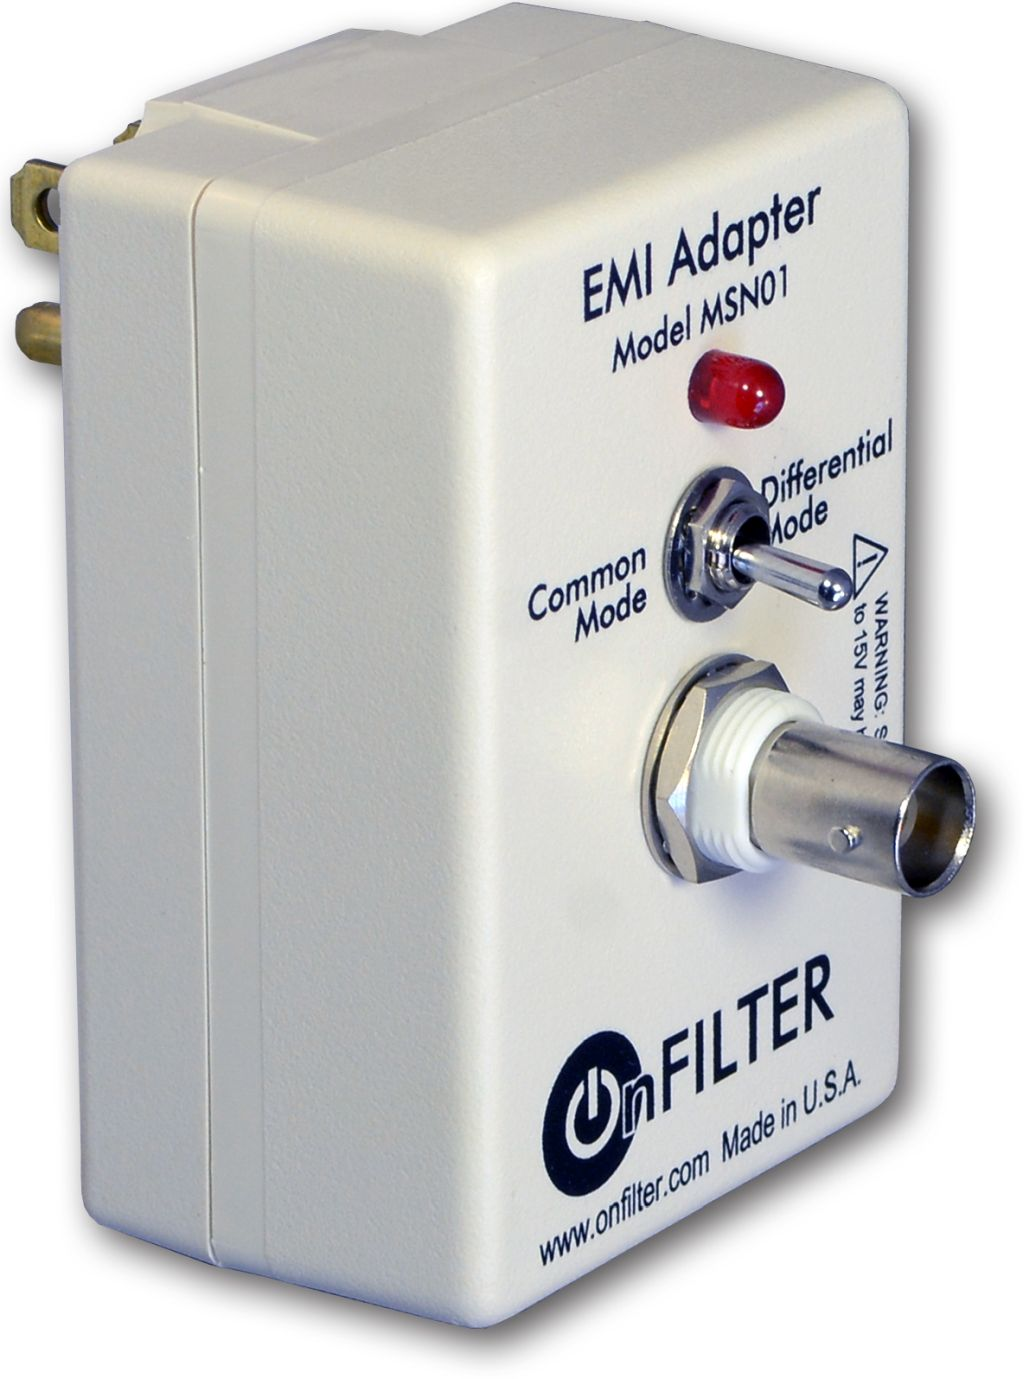 MSN01 EMI Adapter LoRes